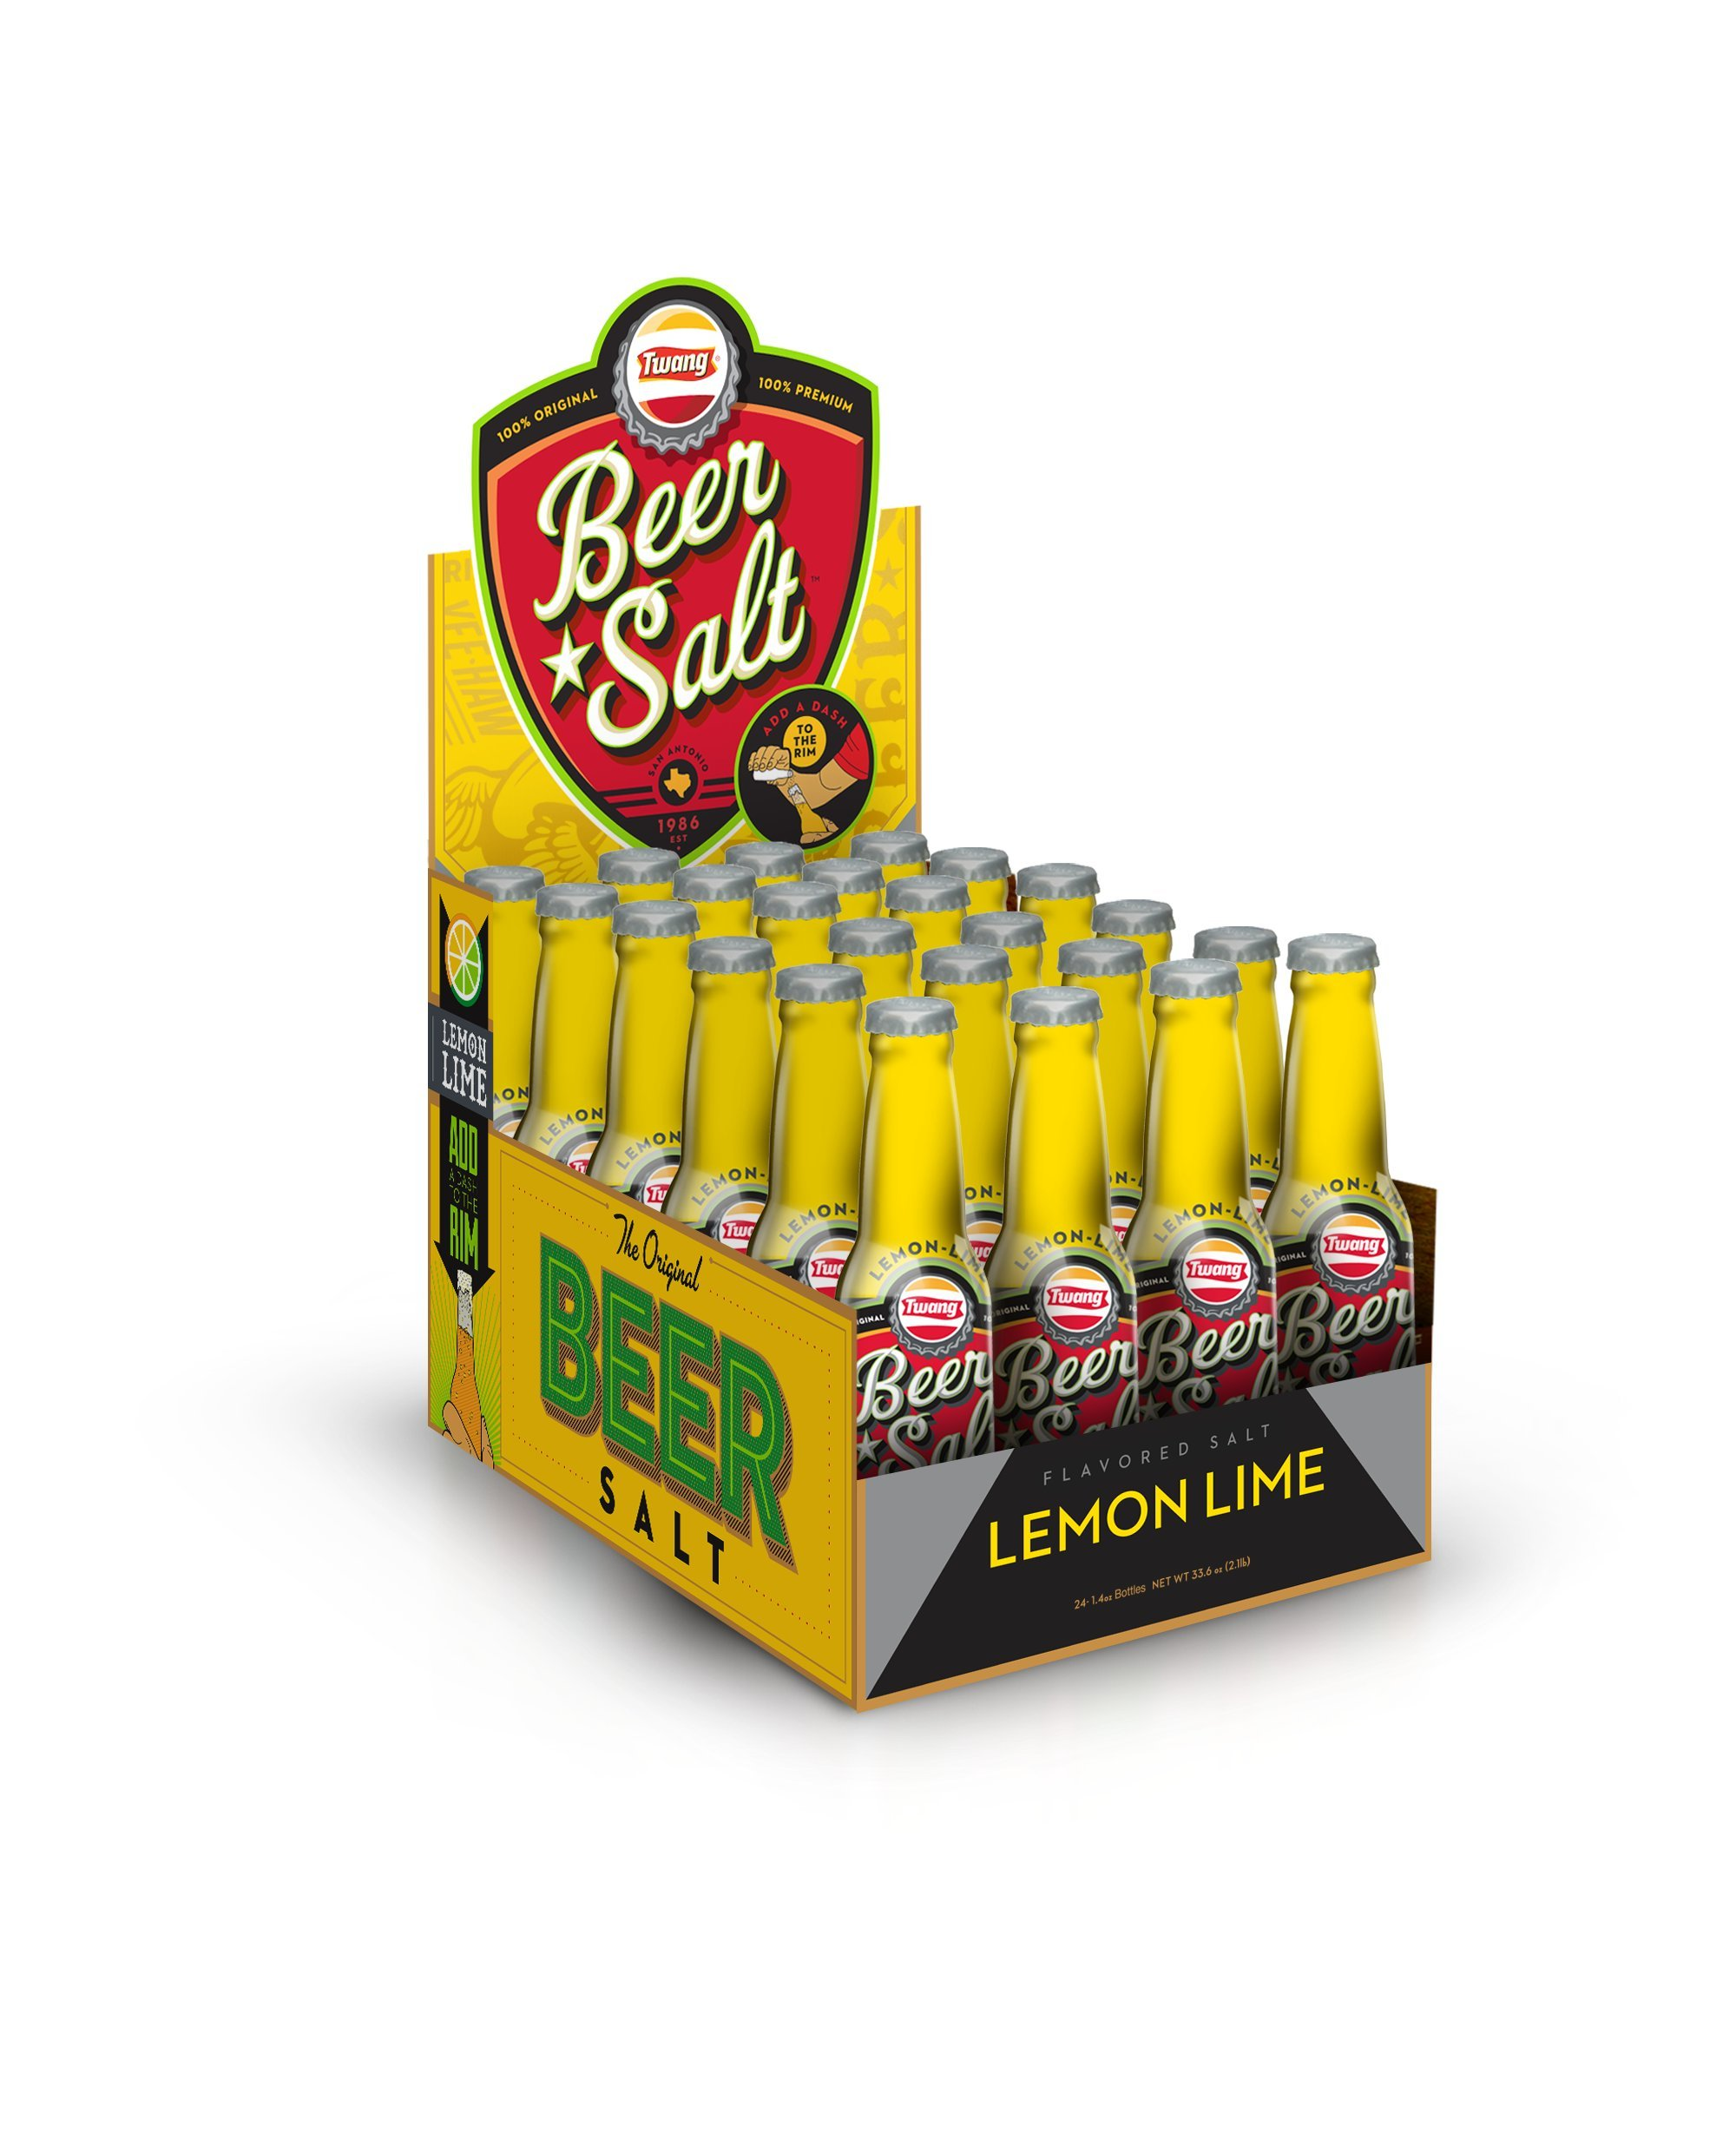 Twang the Original Beer Salt, Lemon-Lime, 1.4-Ounce Bottle, 24 Counts